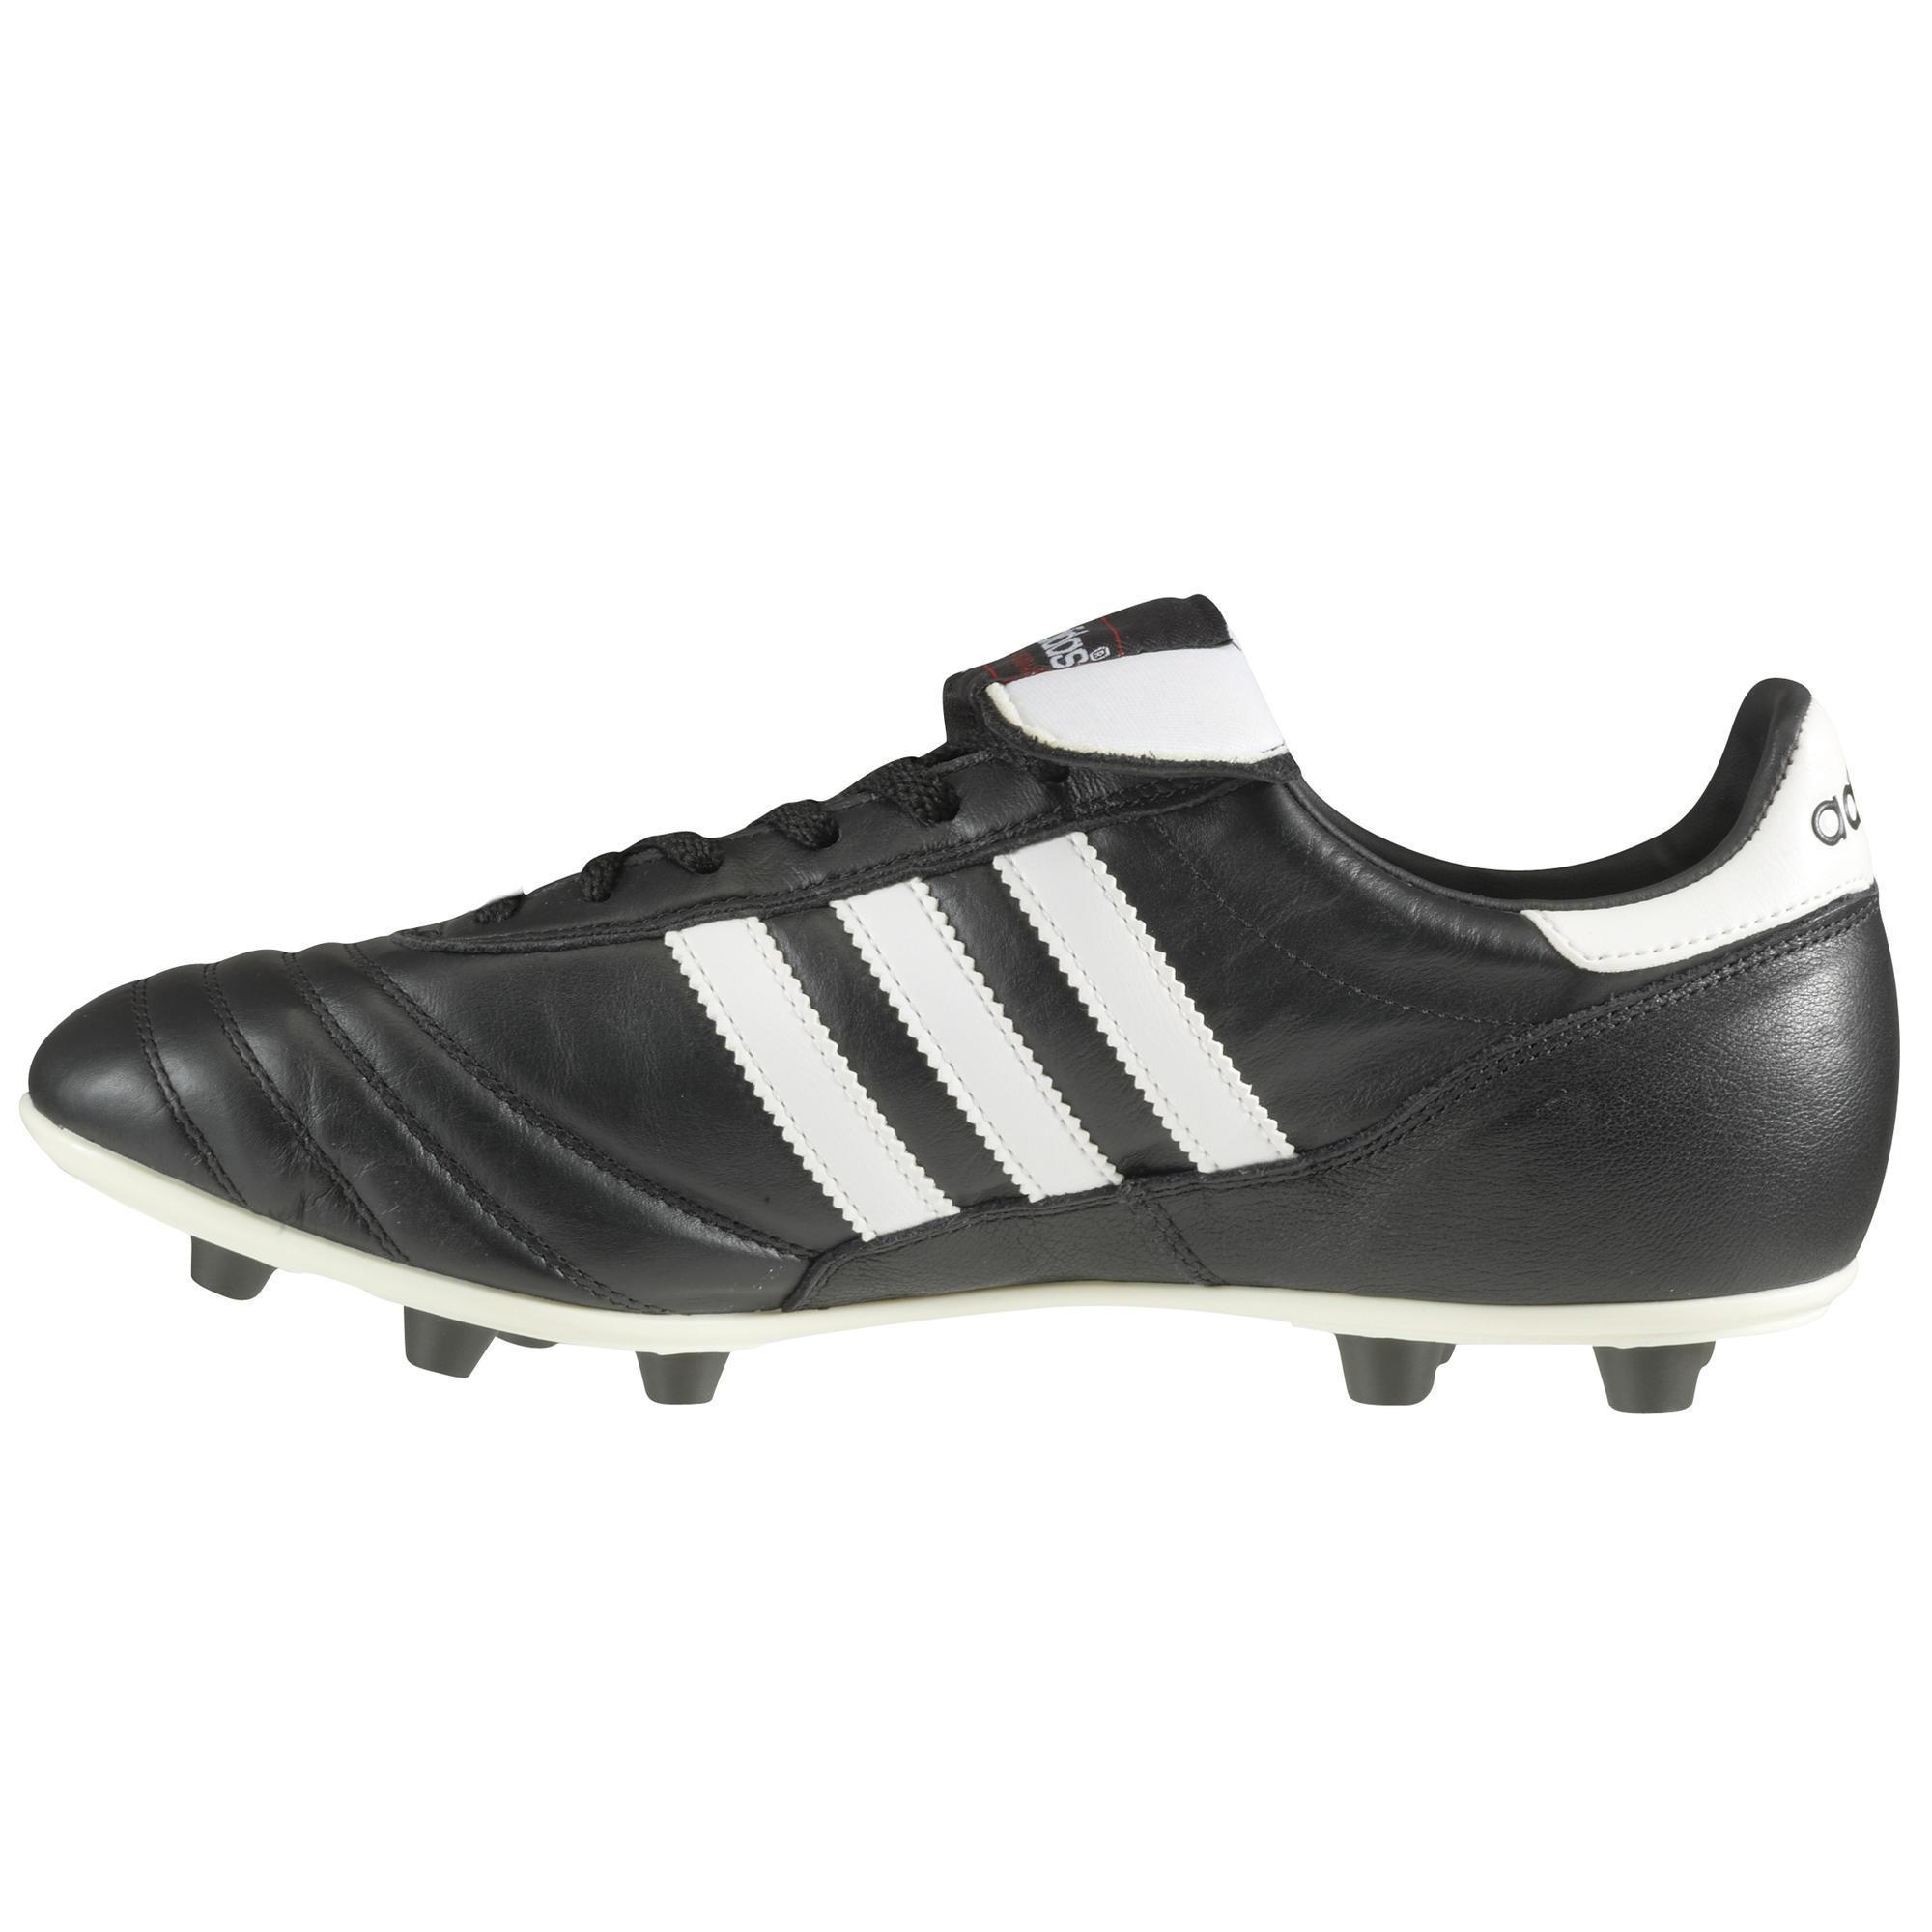 Chaussure football Copa Mundial FG ADIDAS adulte ADIDAS | Decathlon